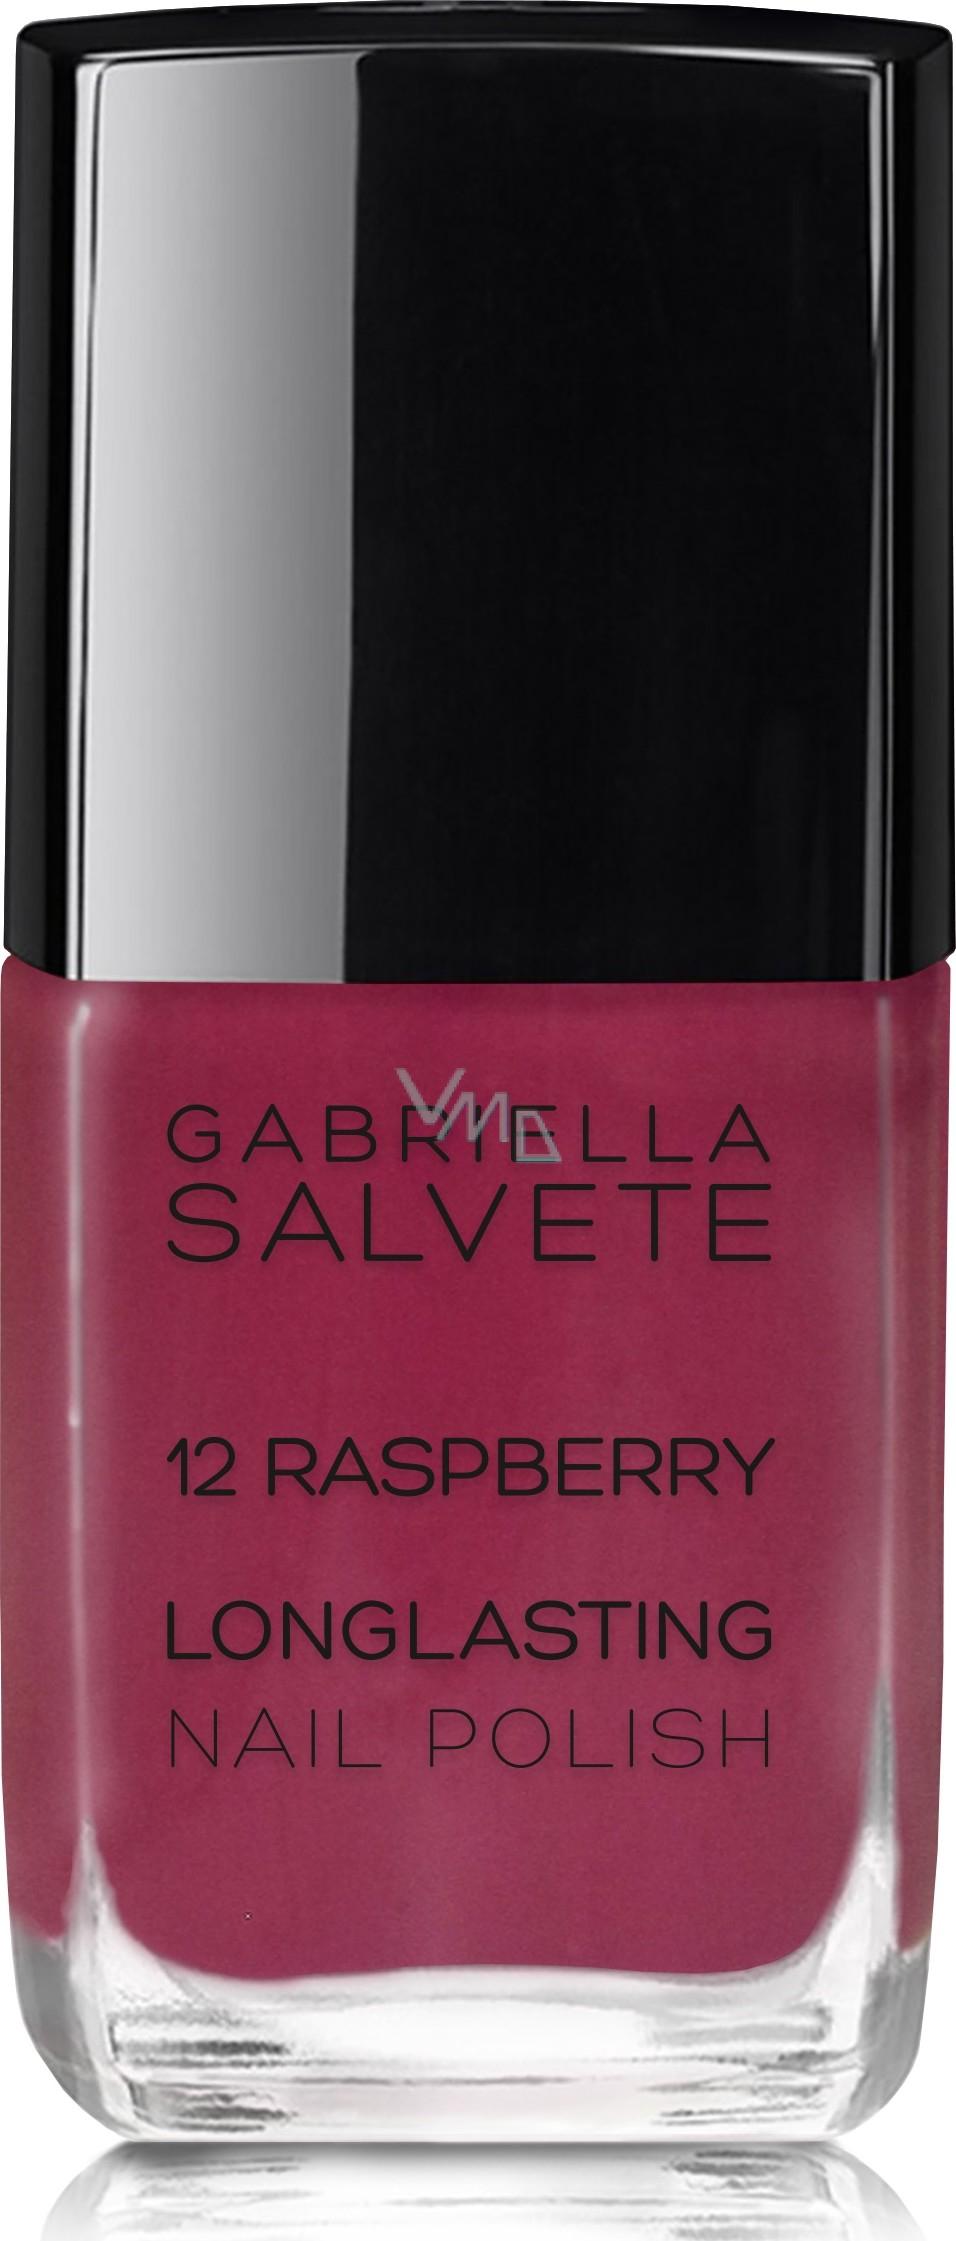 Gabriella Salvete Longlasting Enamel Dlouhotrvajici Lak Na Nehty S Vysokym Leskem 12 Raspberry 11 Ml Vmd Drogerie A Parfumerie